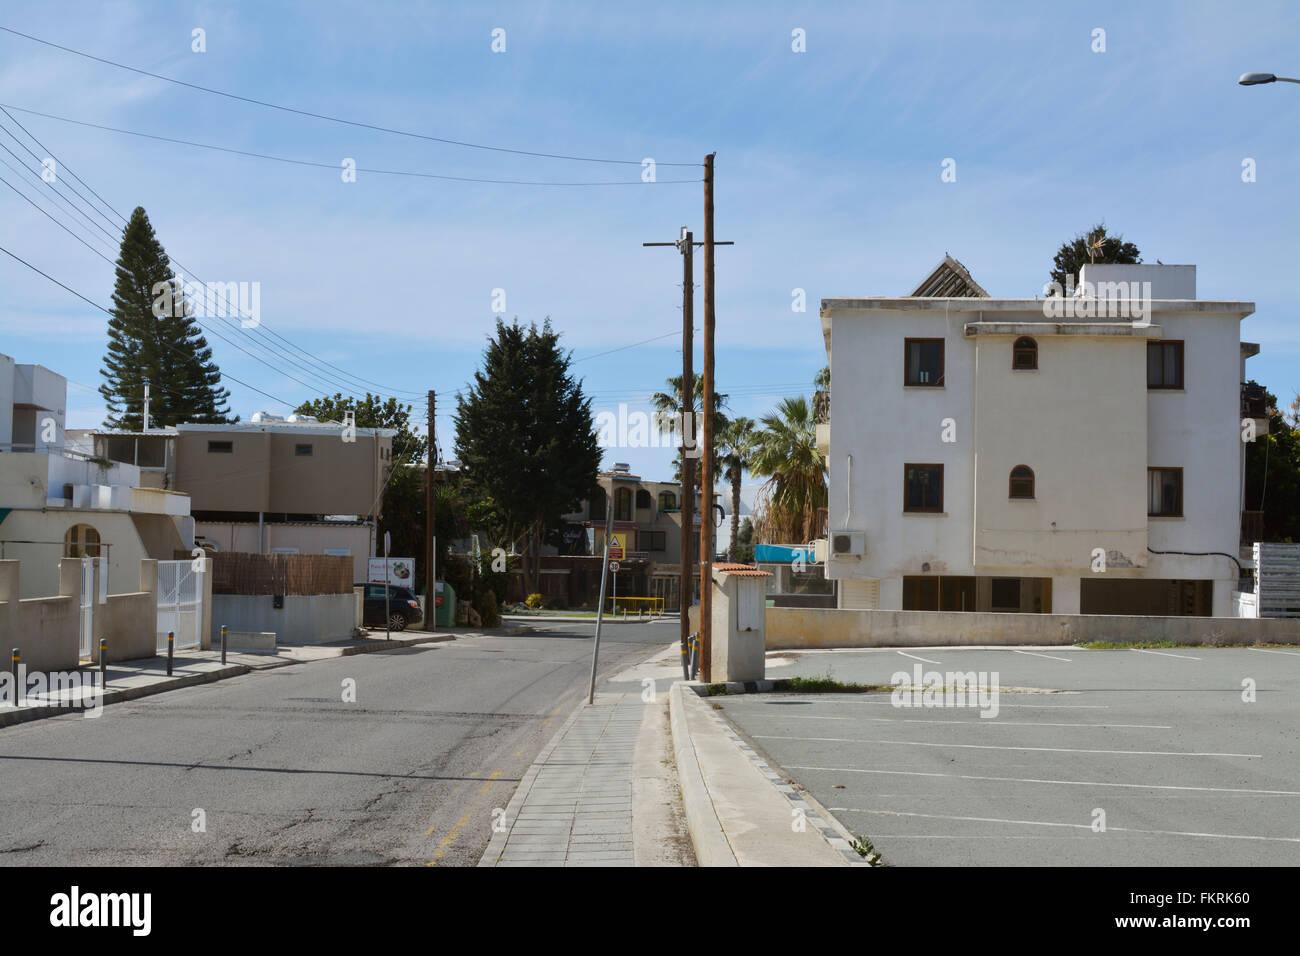 Cyprus - Sense of Place - Stock Image